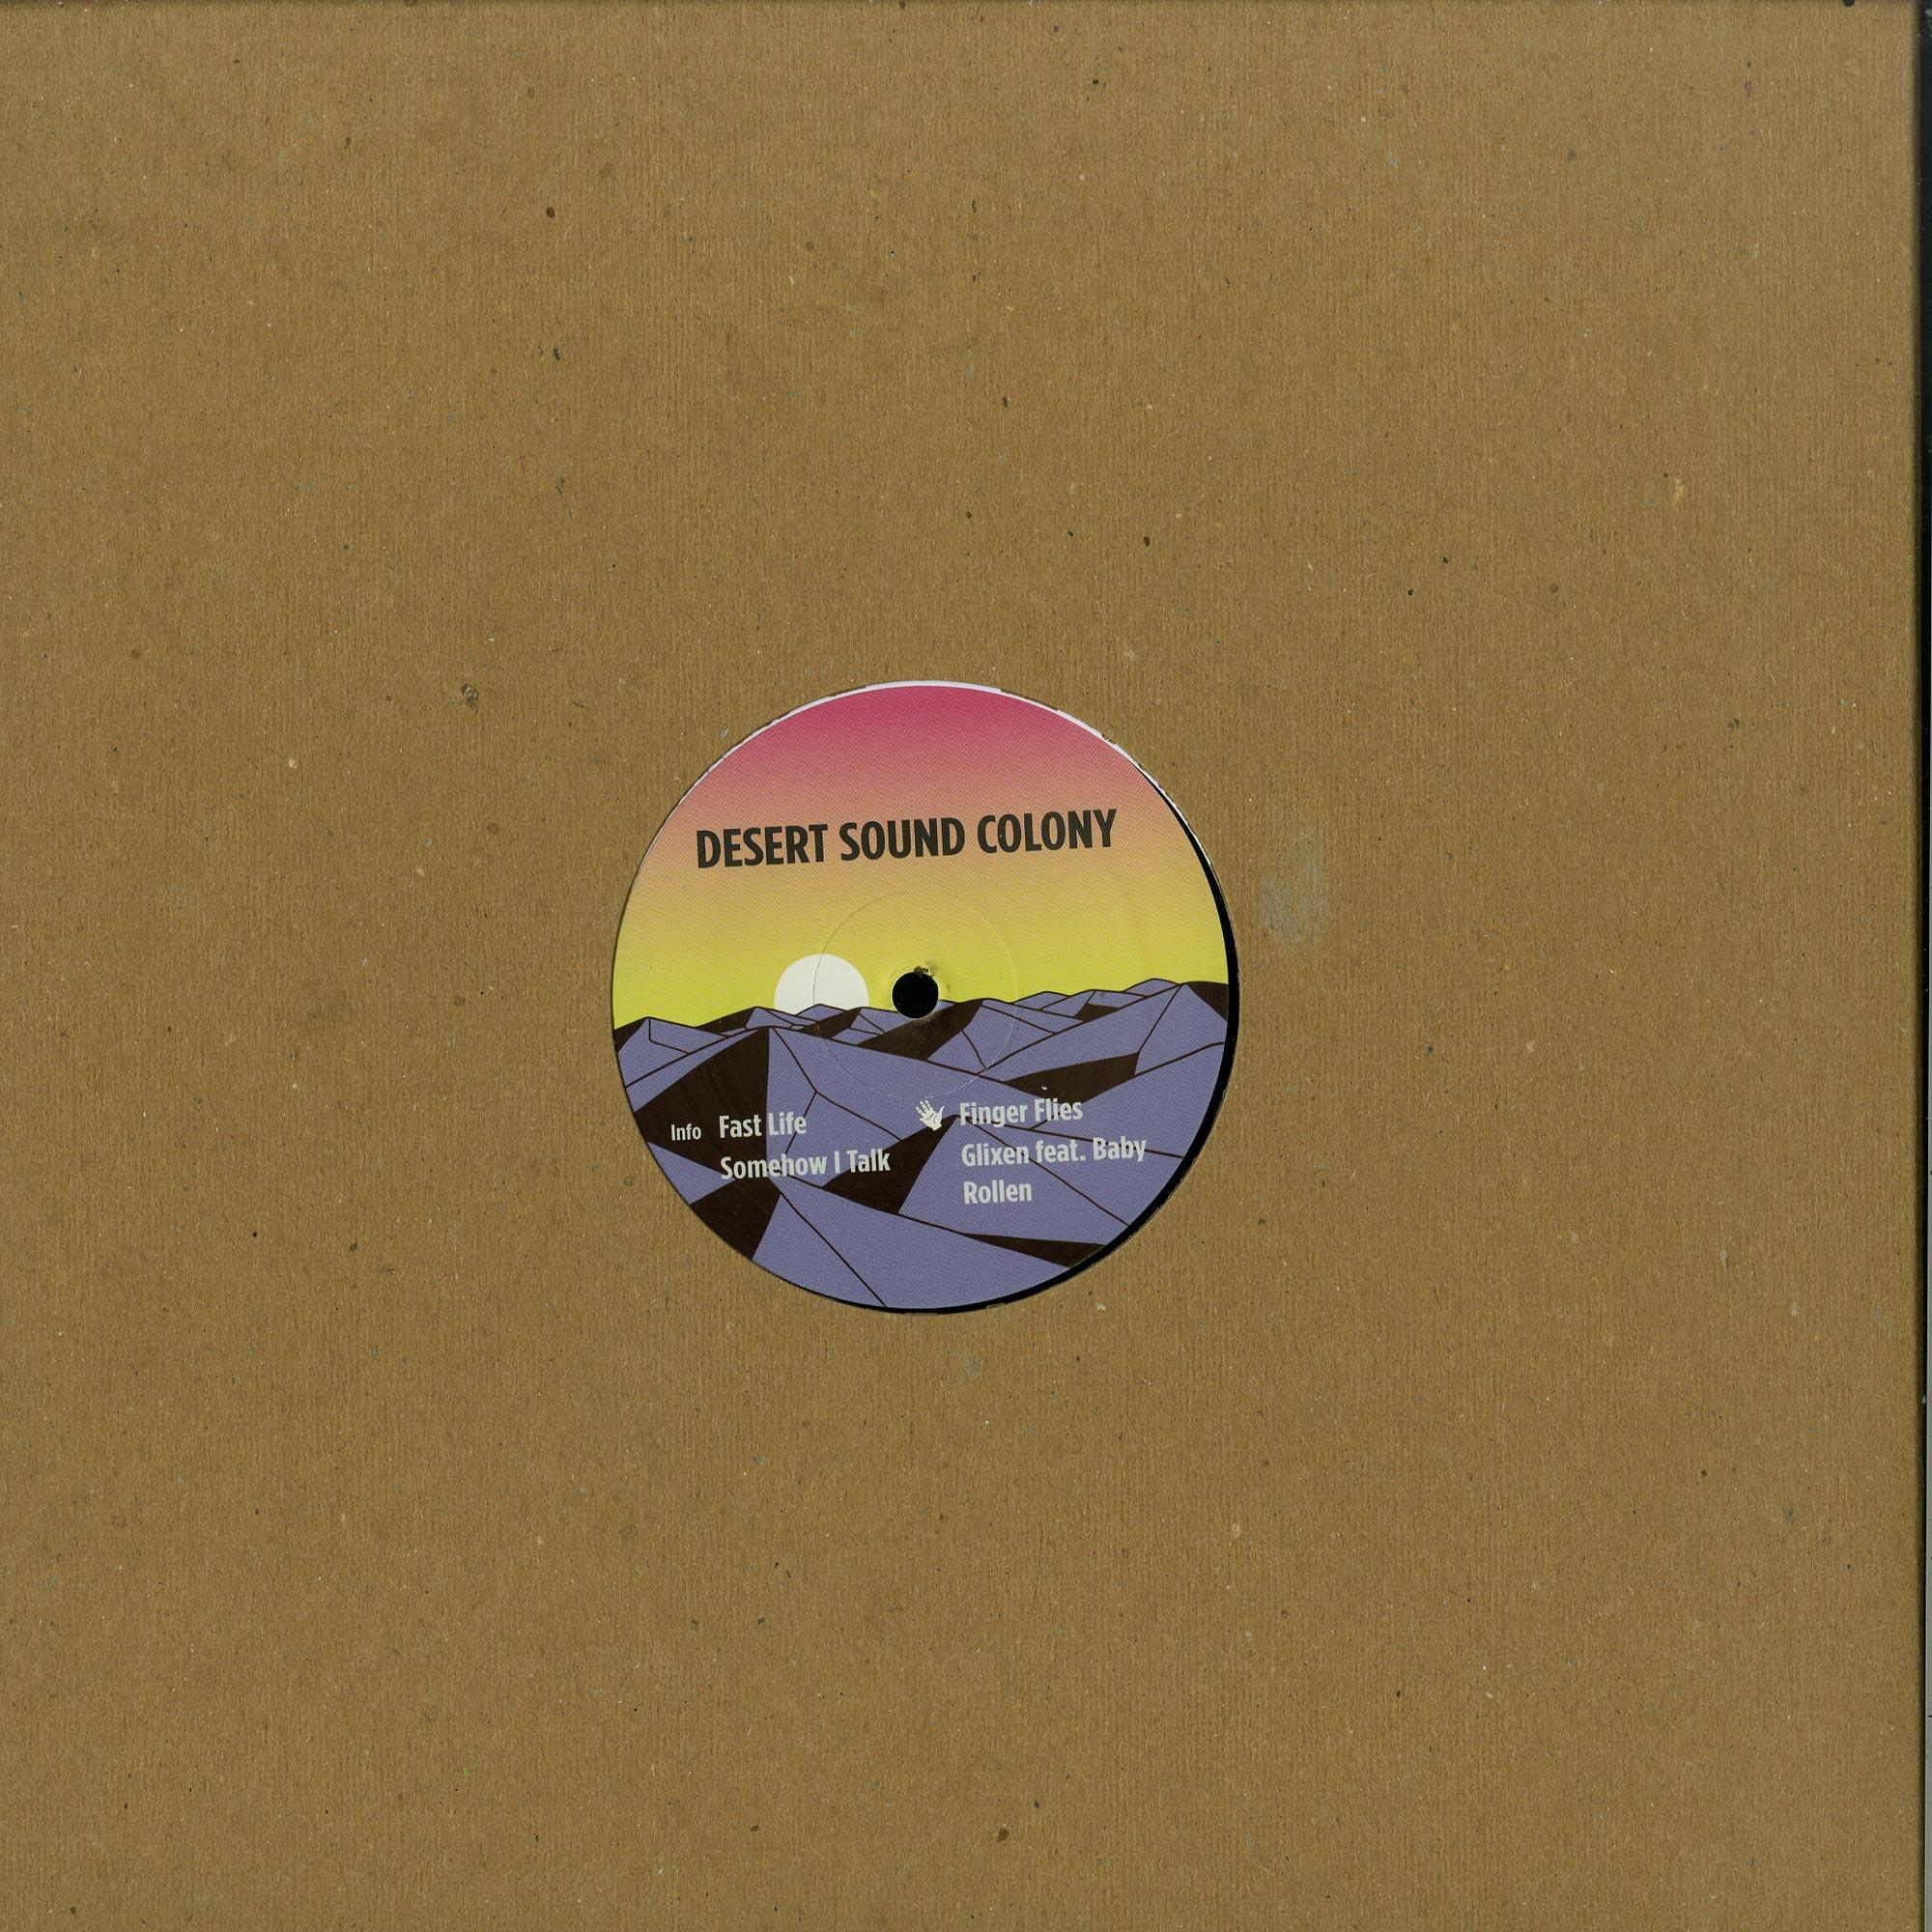 Desert Sound Colony - FAST LIFE EP